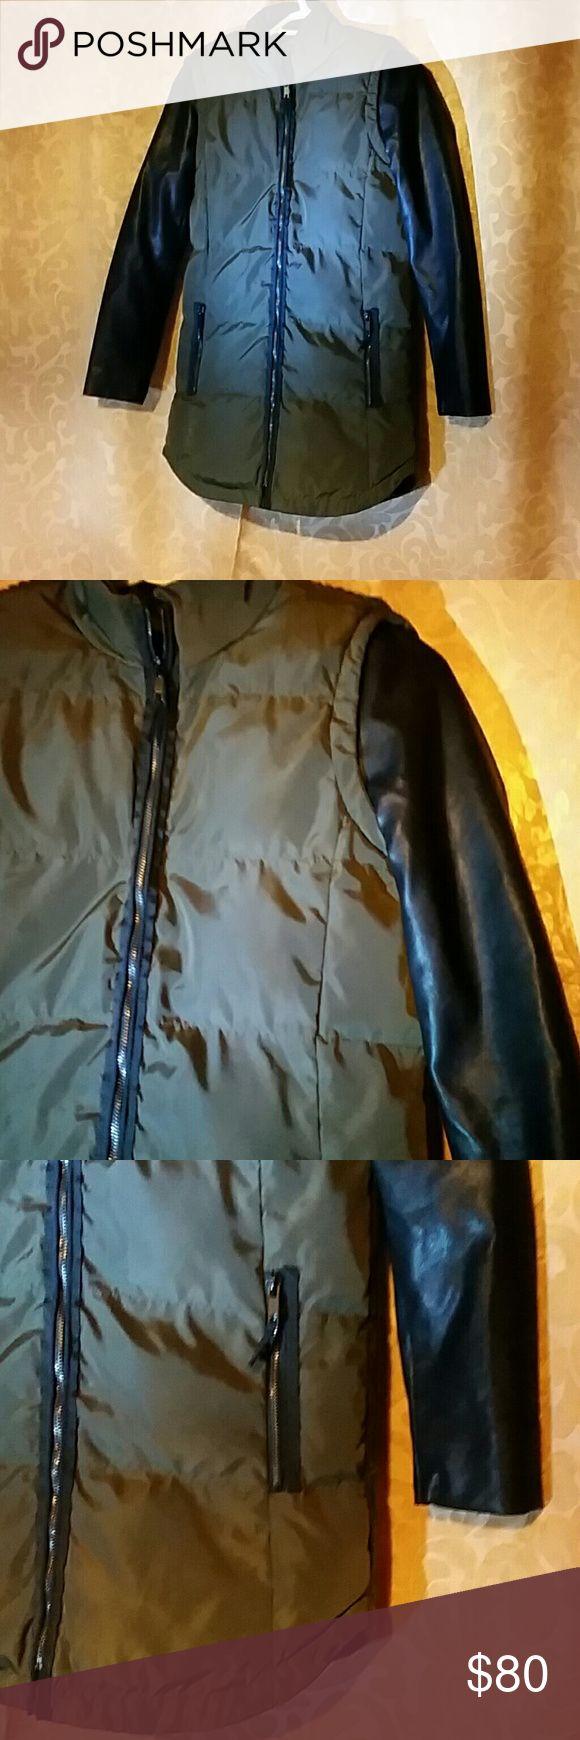 Jacket ZARA BASIC XS or S sz Warm  ZARA JACKET, black/grey color, shiny fabric front, zipper front and two pokets, used,  rare design. Free gift with order. ZARA Jackets & Coats Blazers